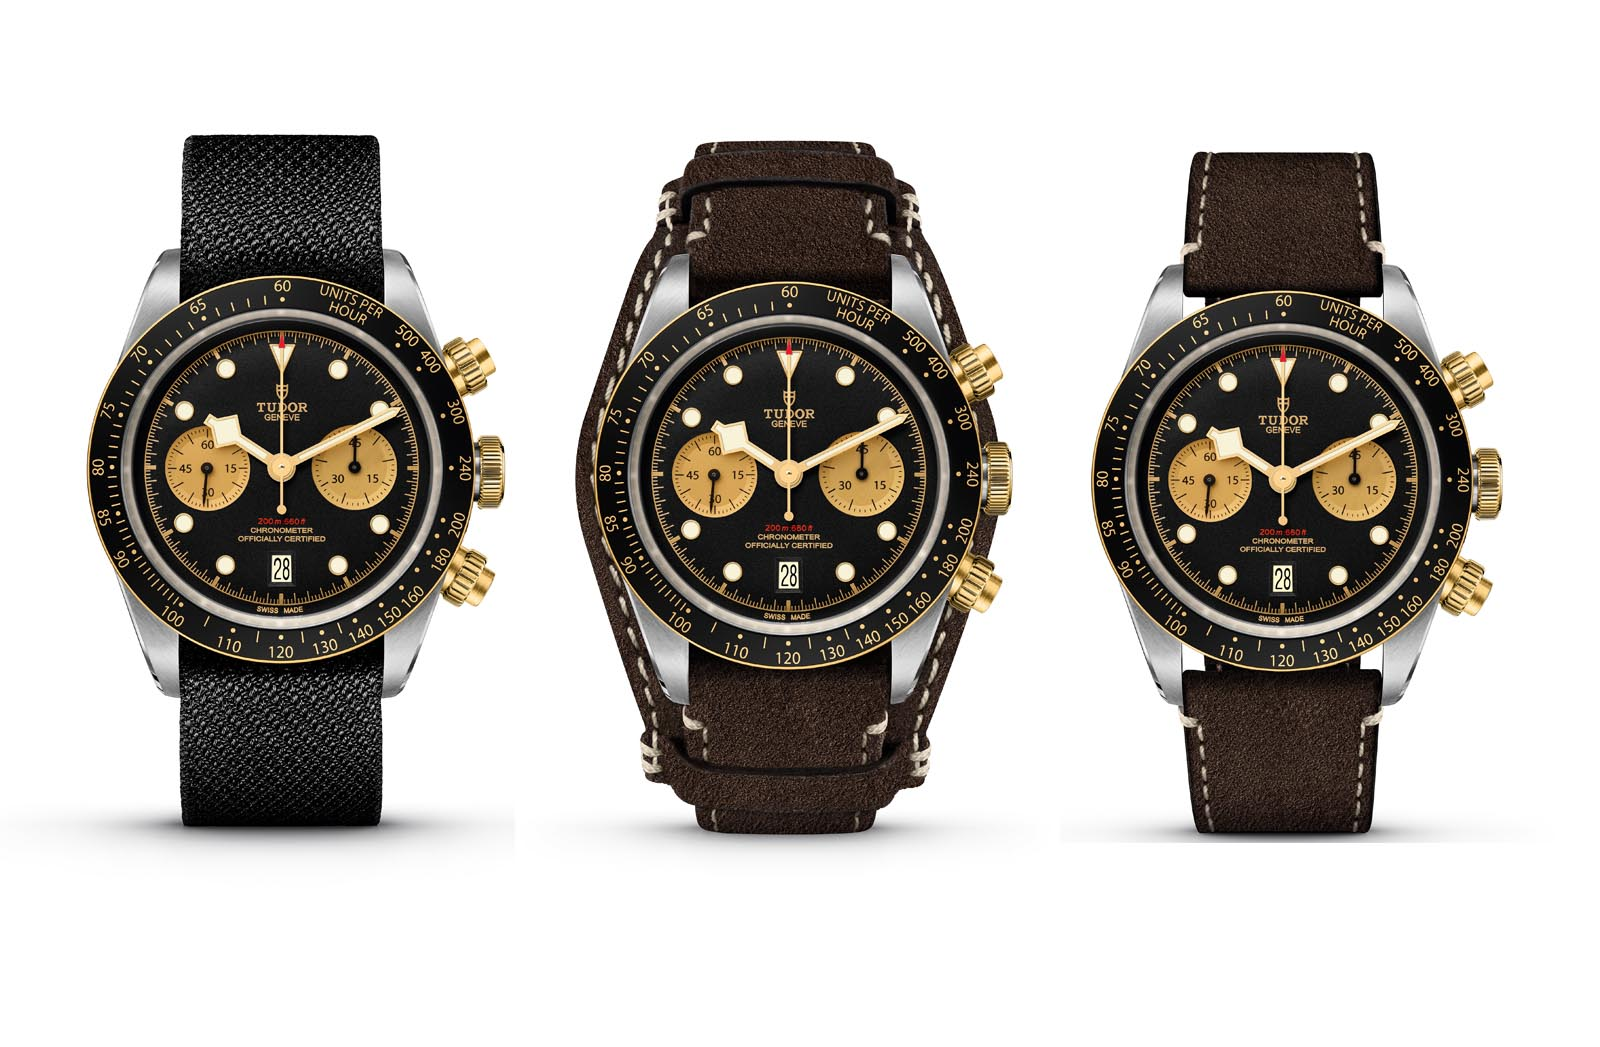 Tudor Black Bay Chronograph S&G 4